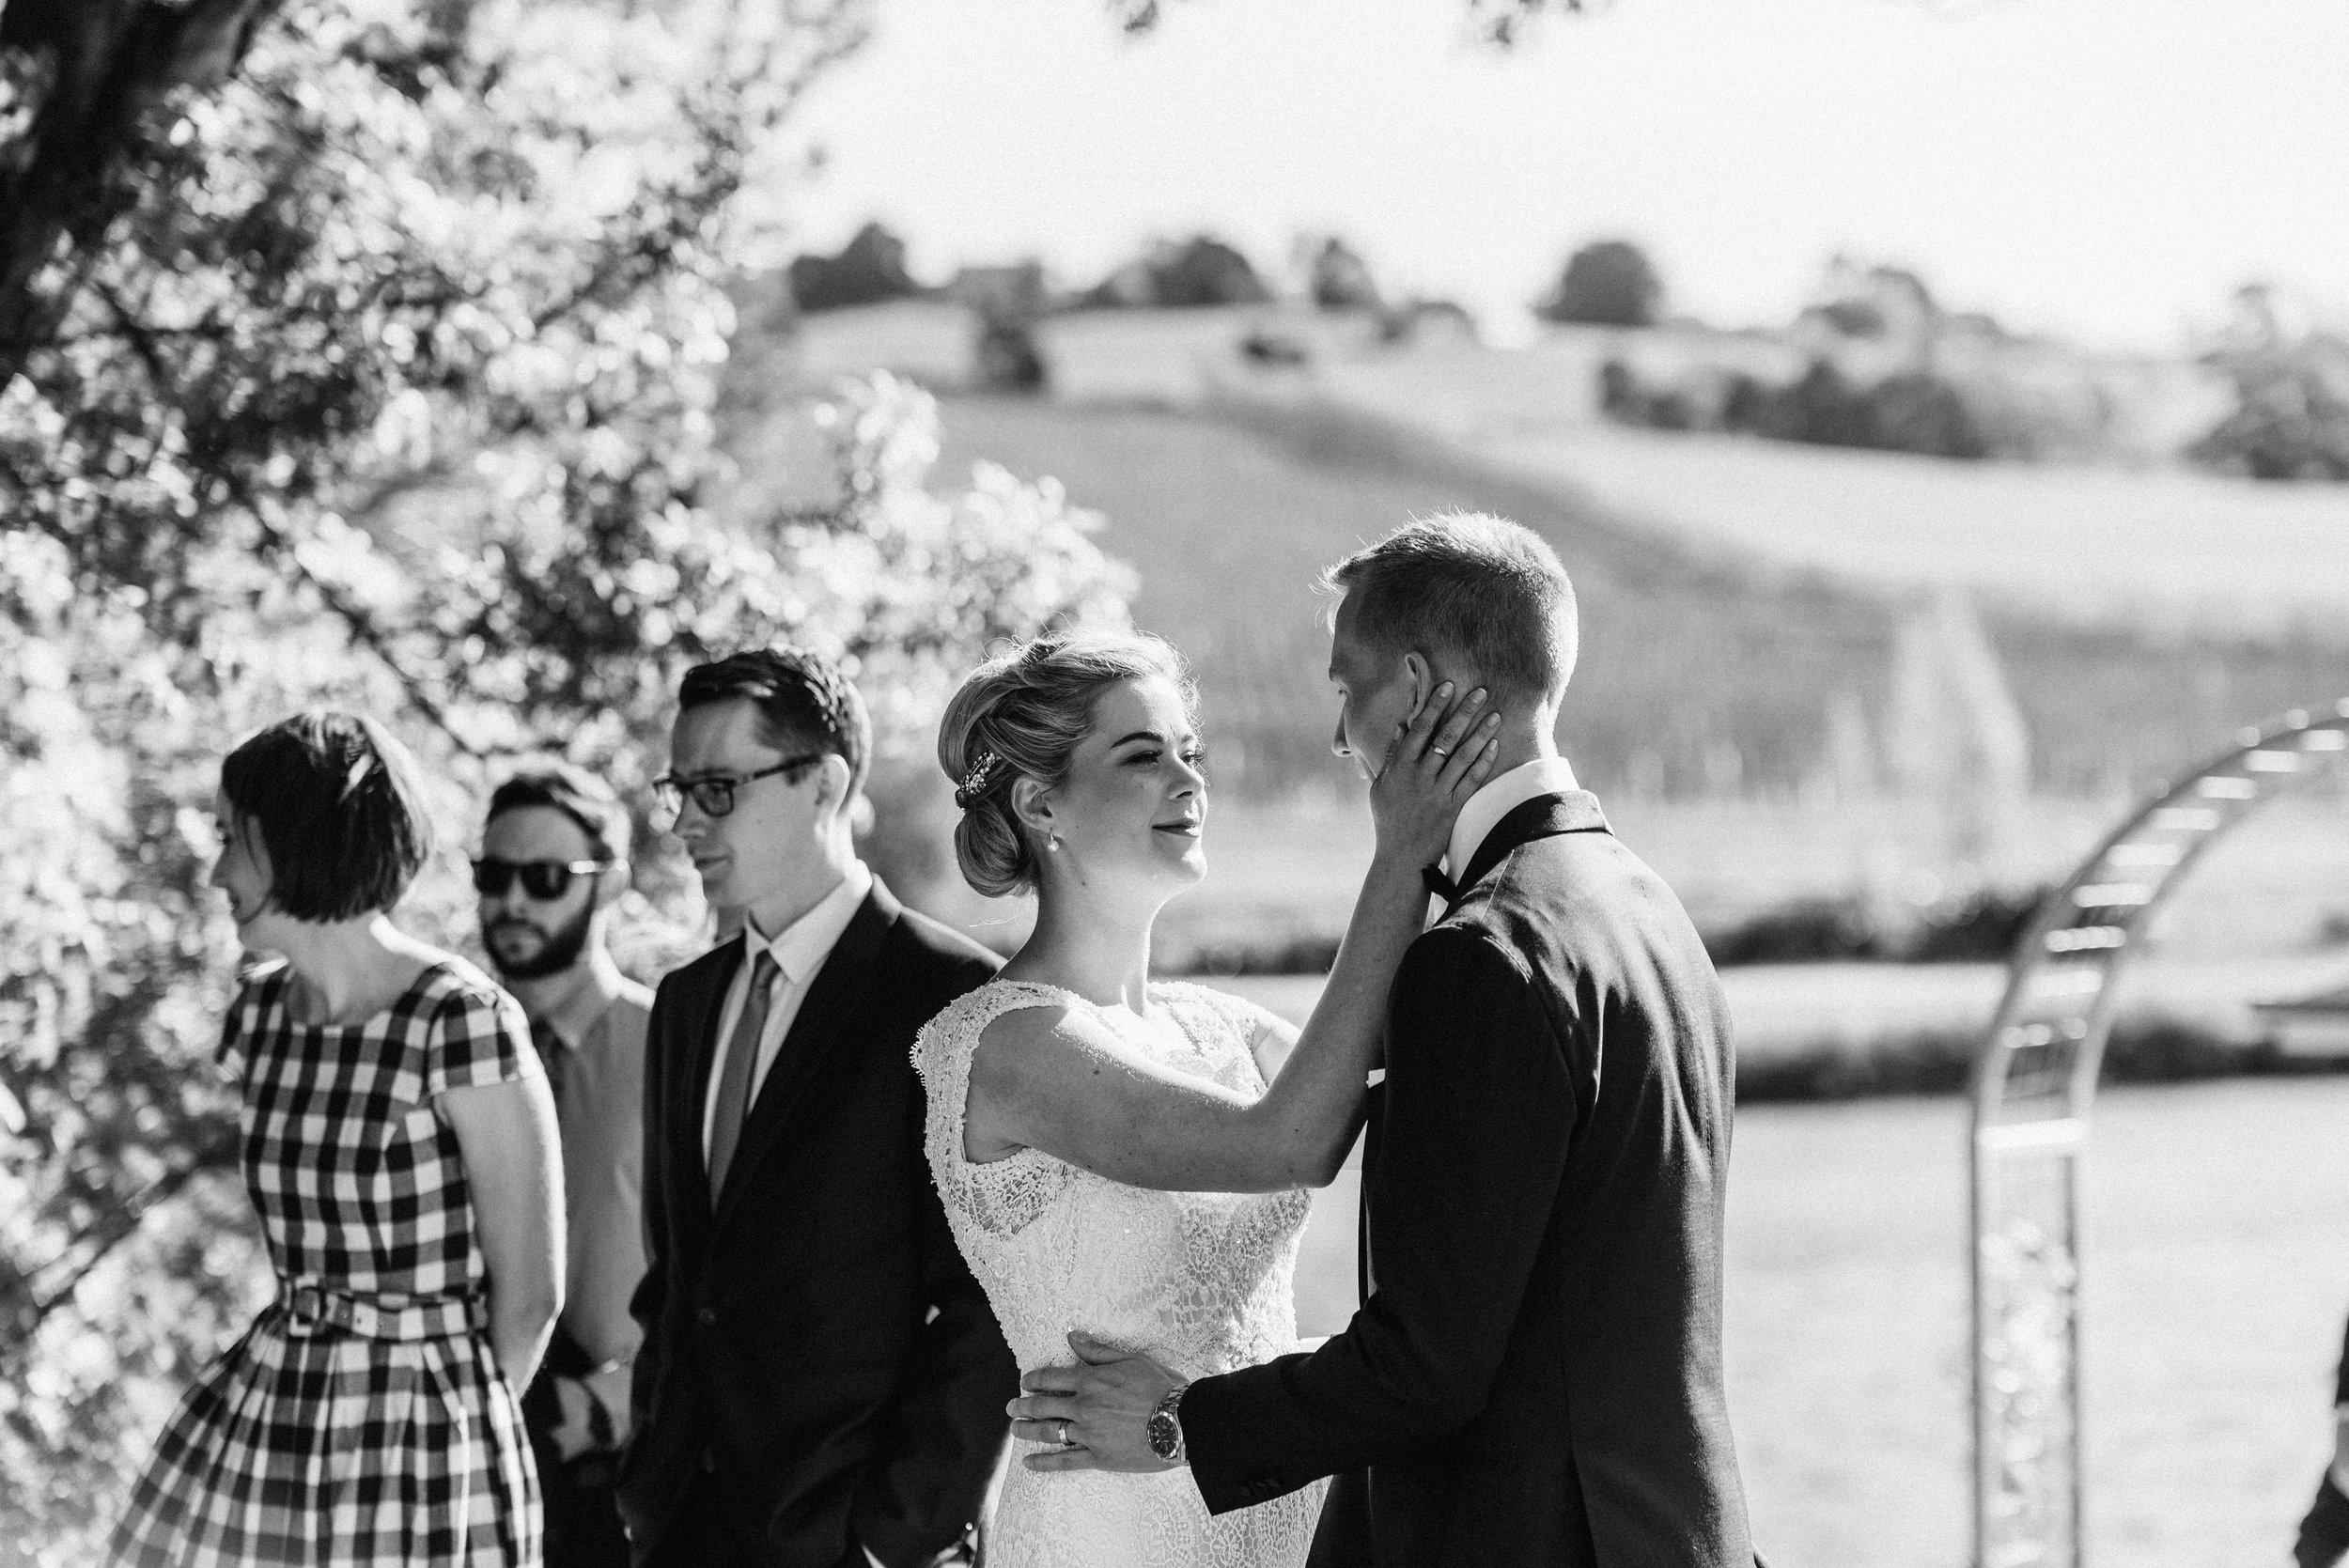 Josef-Chromy-Wedding-50.jpg